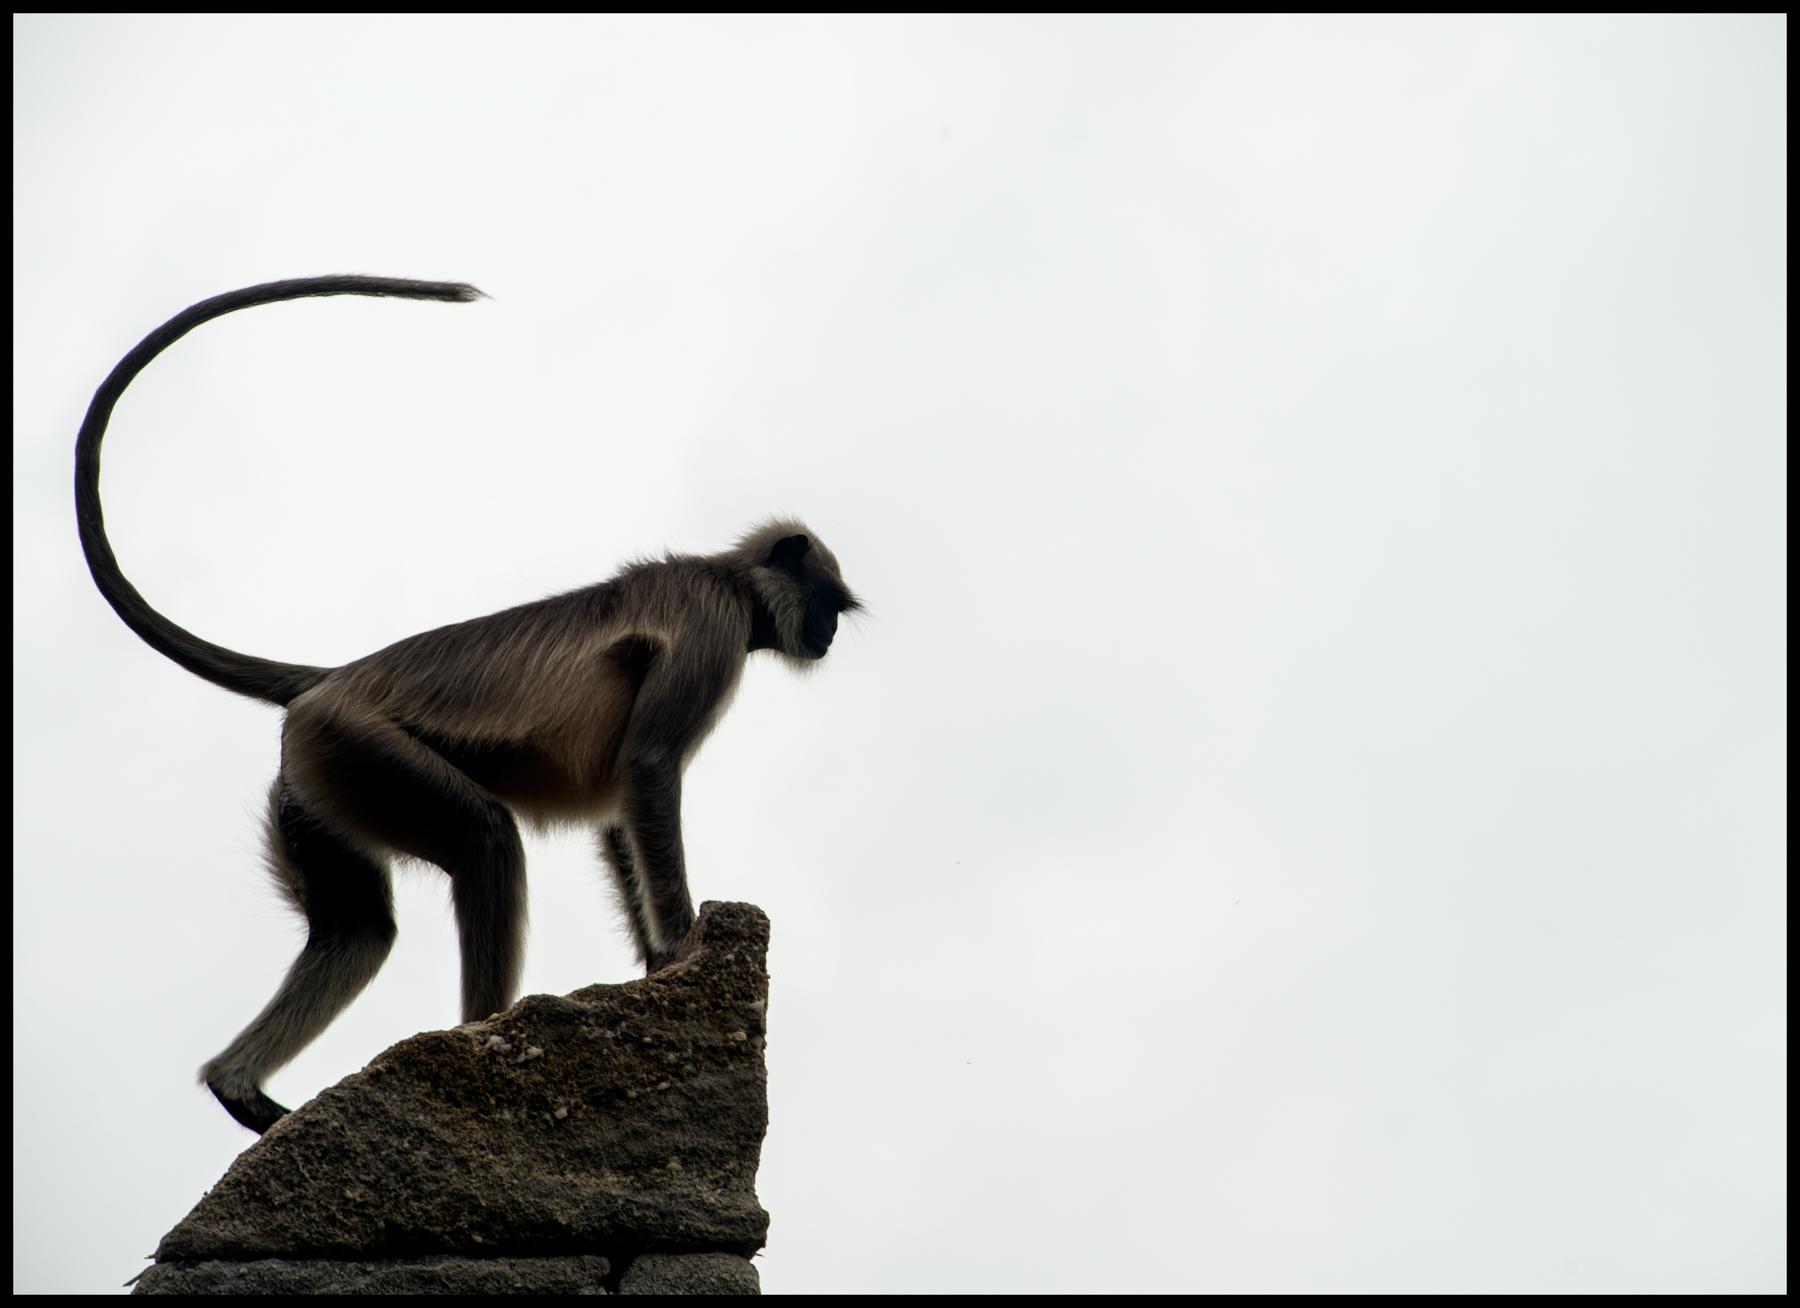 monkeyOnTheWatch.jpg